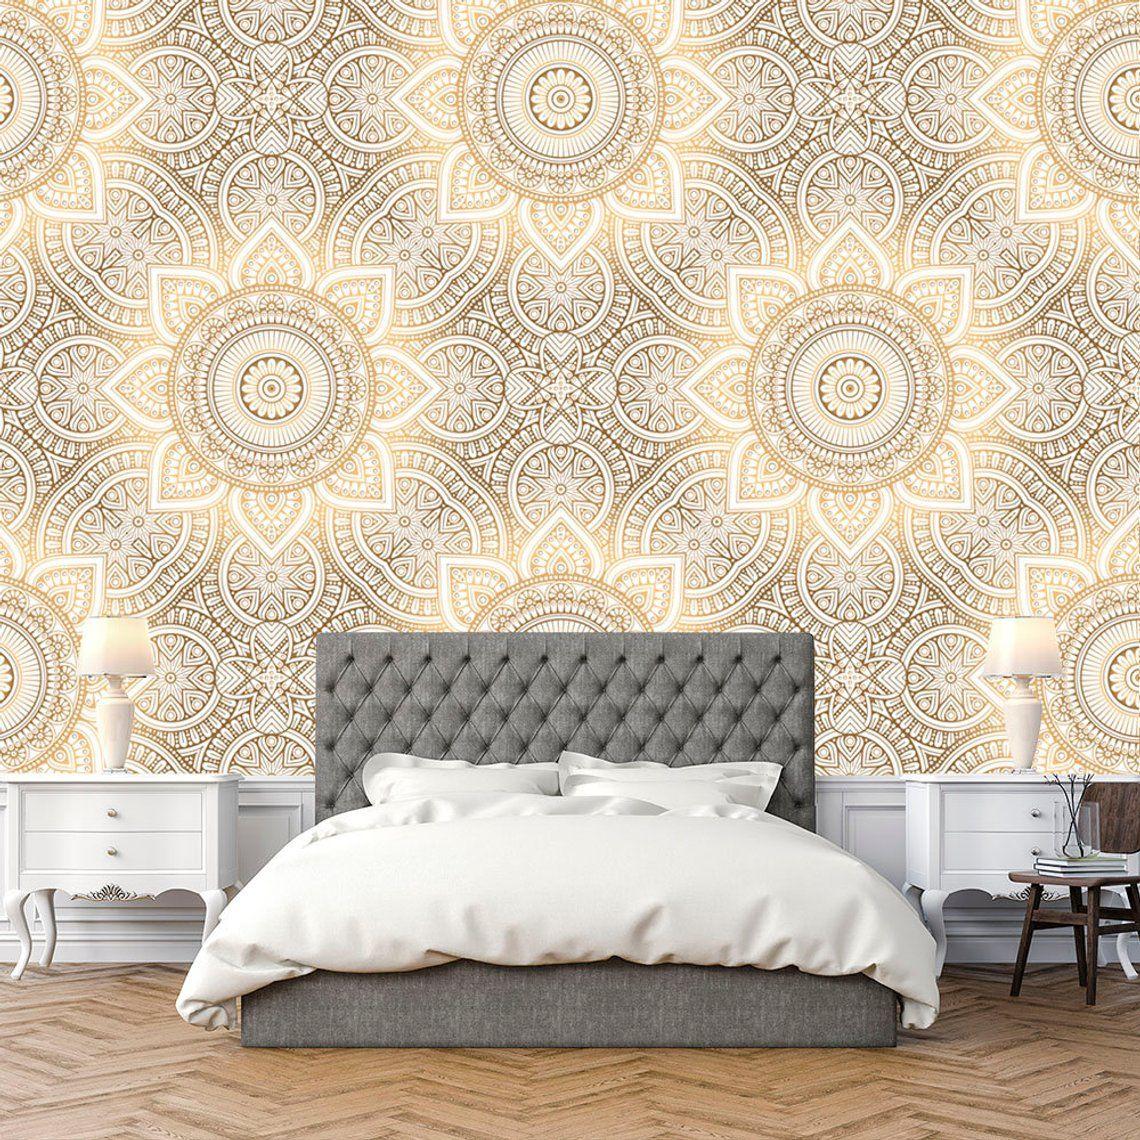 Mandala Wallpaper Indian Boho Wallpaper Luxury Art Removable Etsy Boho Wallpaper Mandala Wallpaper Wallpaper Bedroom